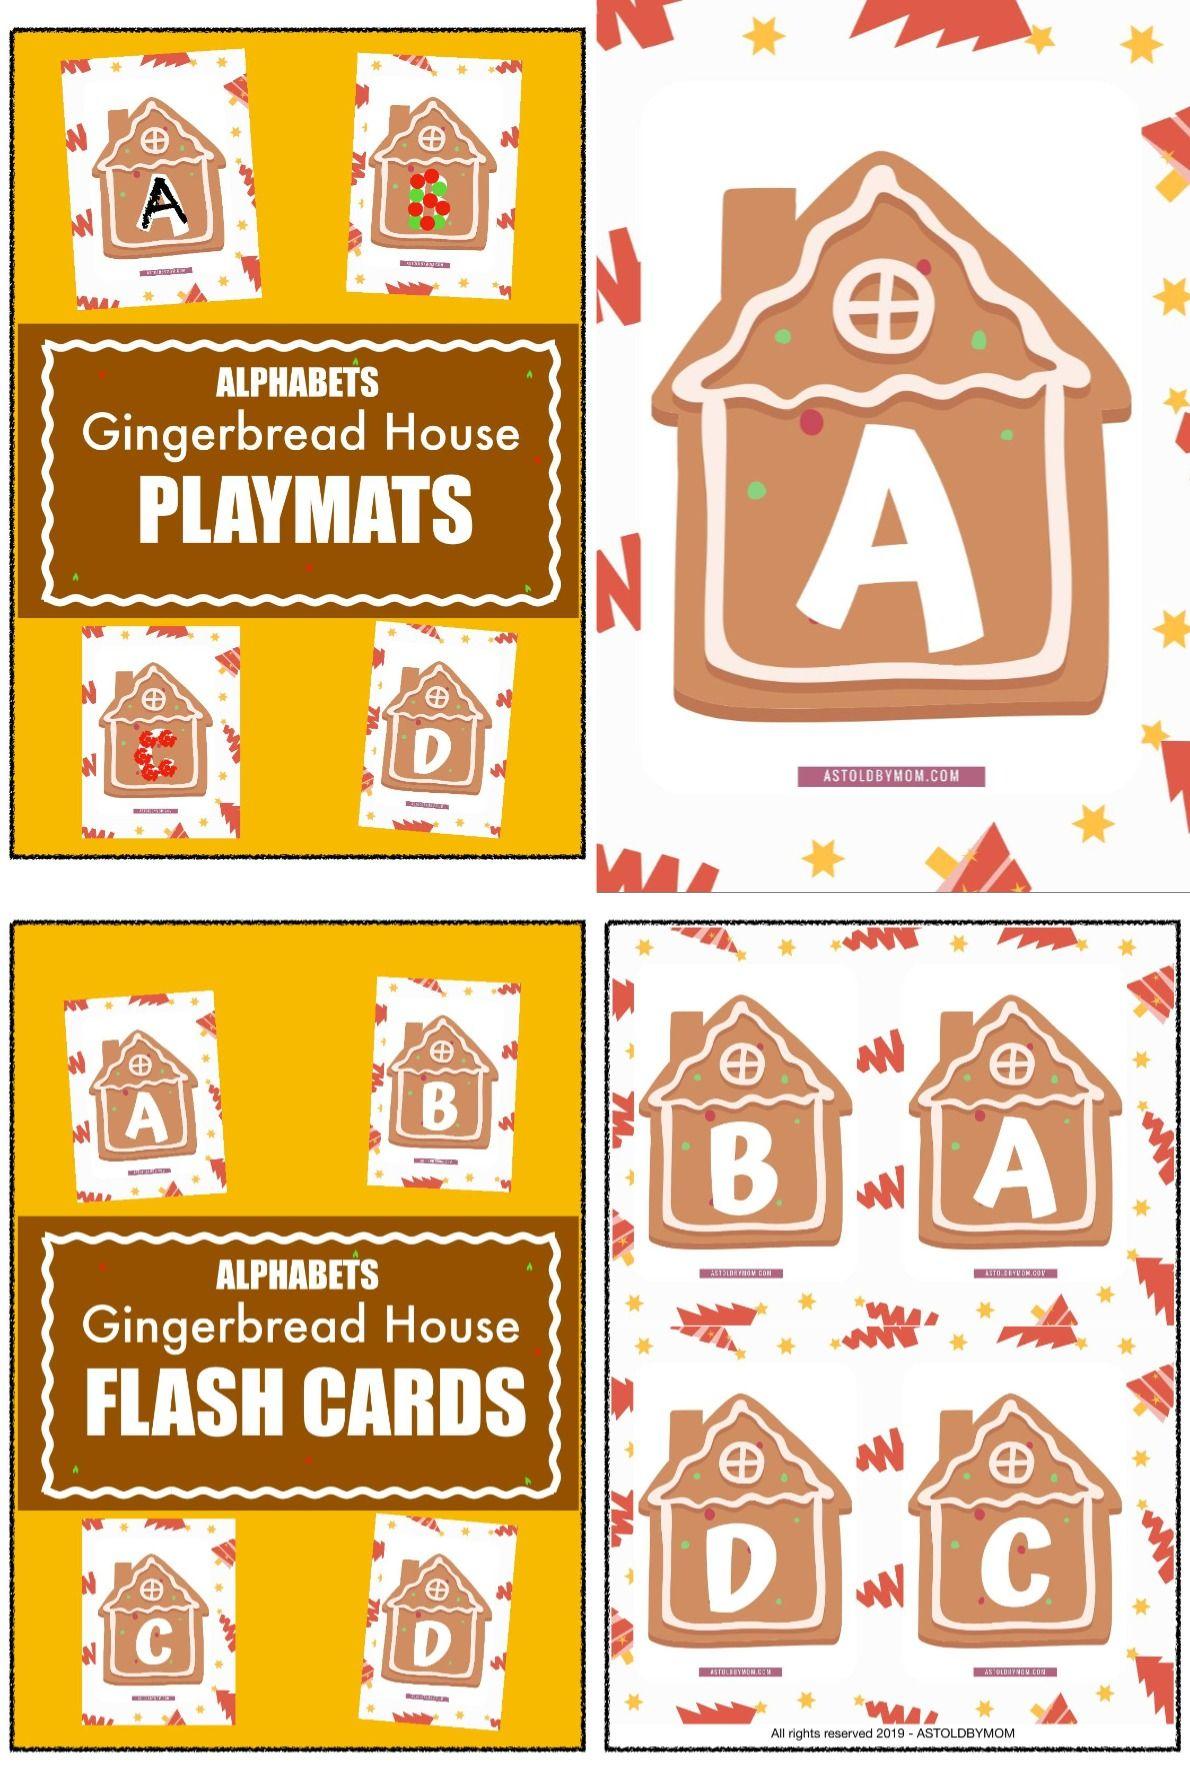 100 Gingerbread House English Alphabets Playmats Amp Flash